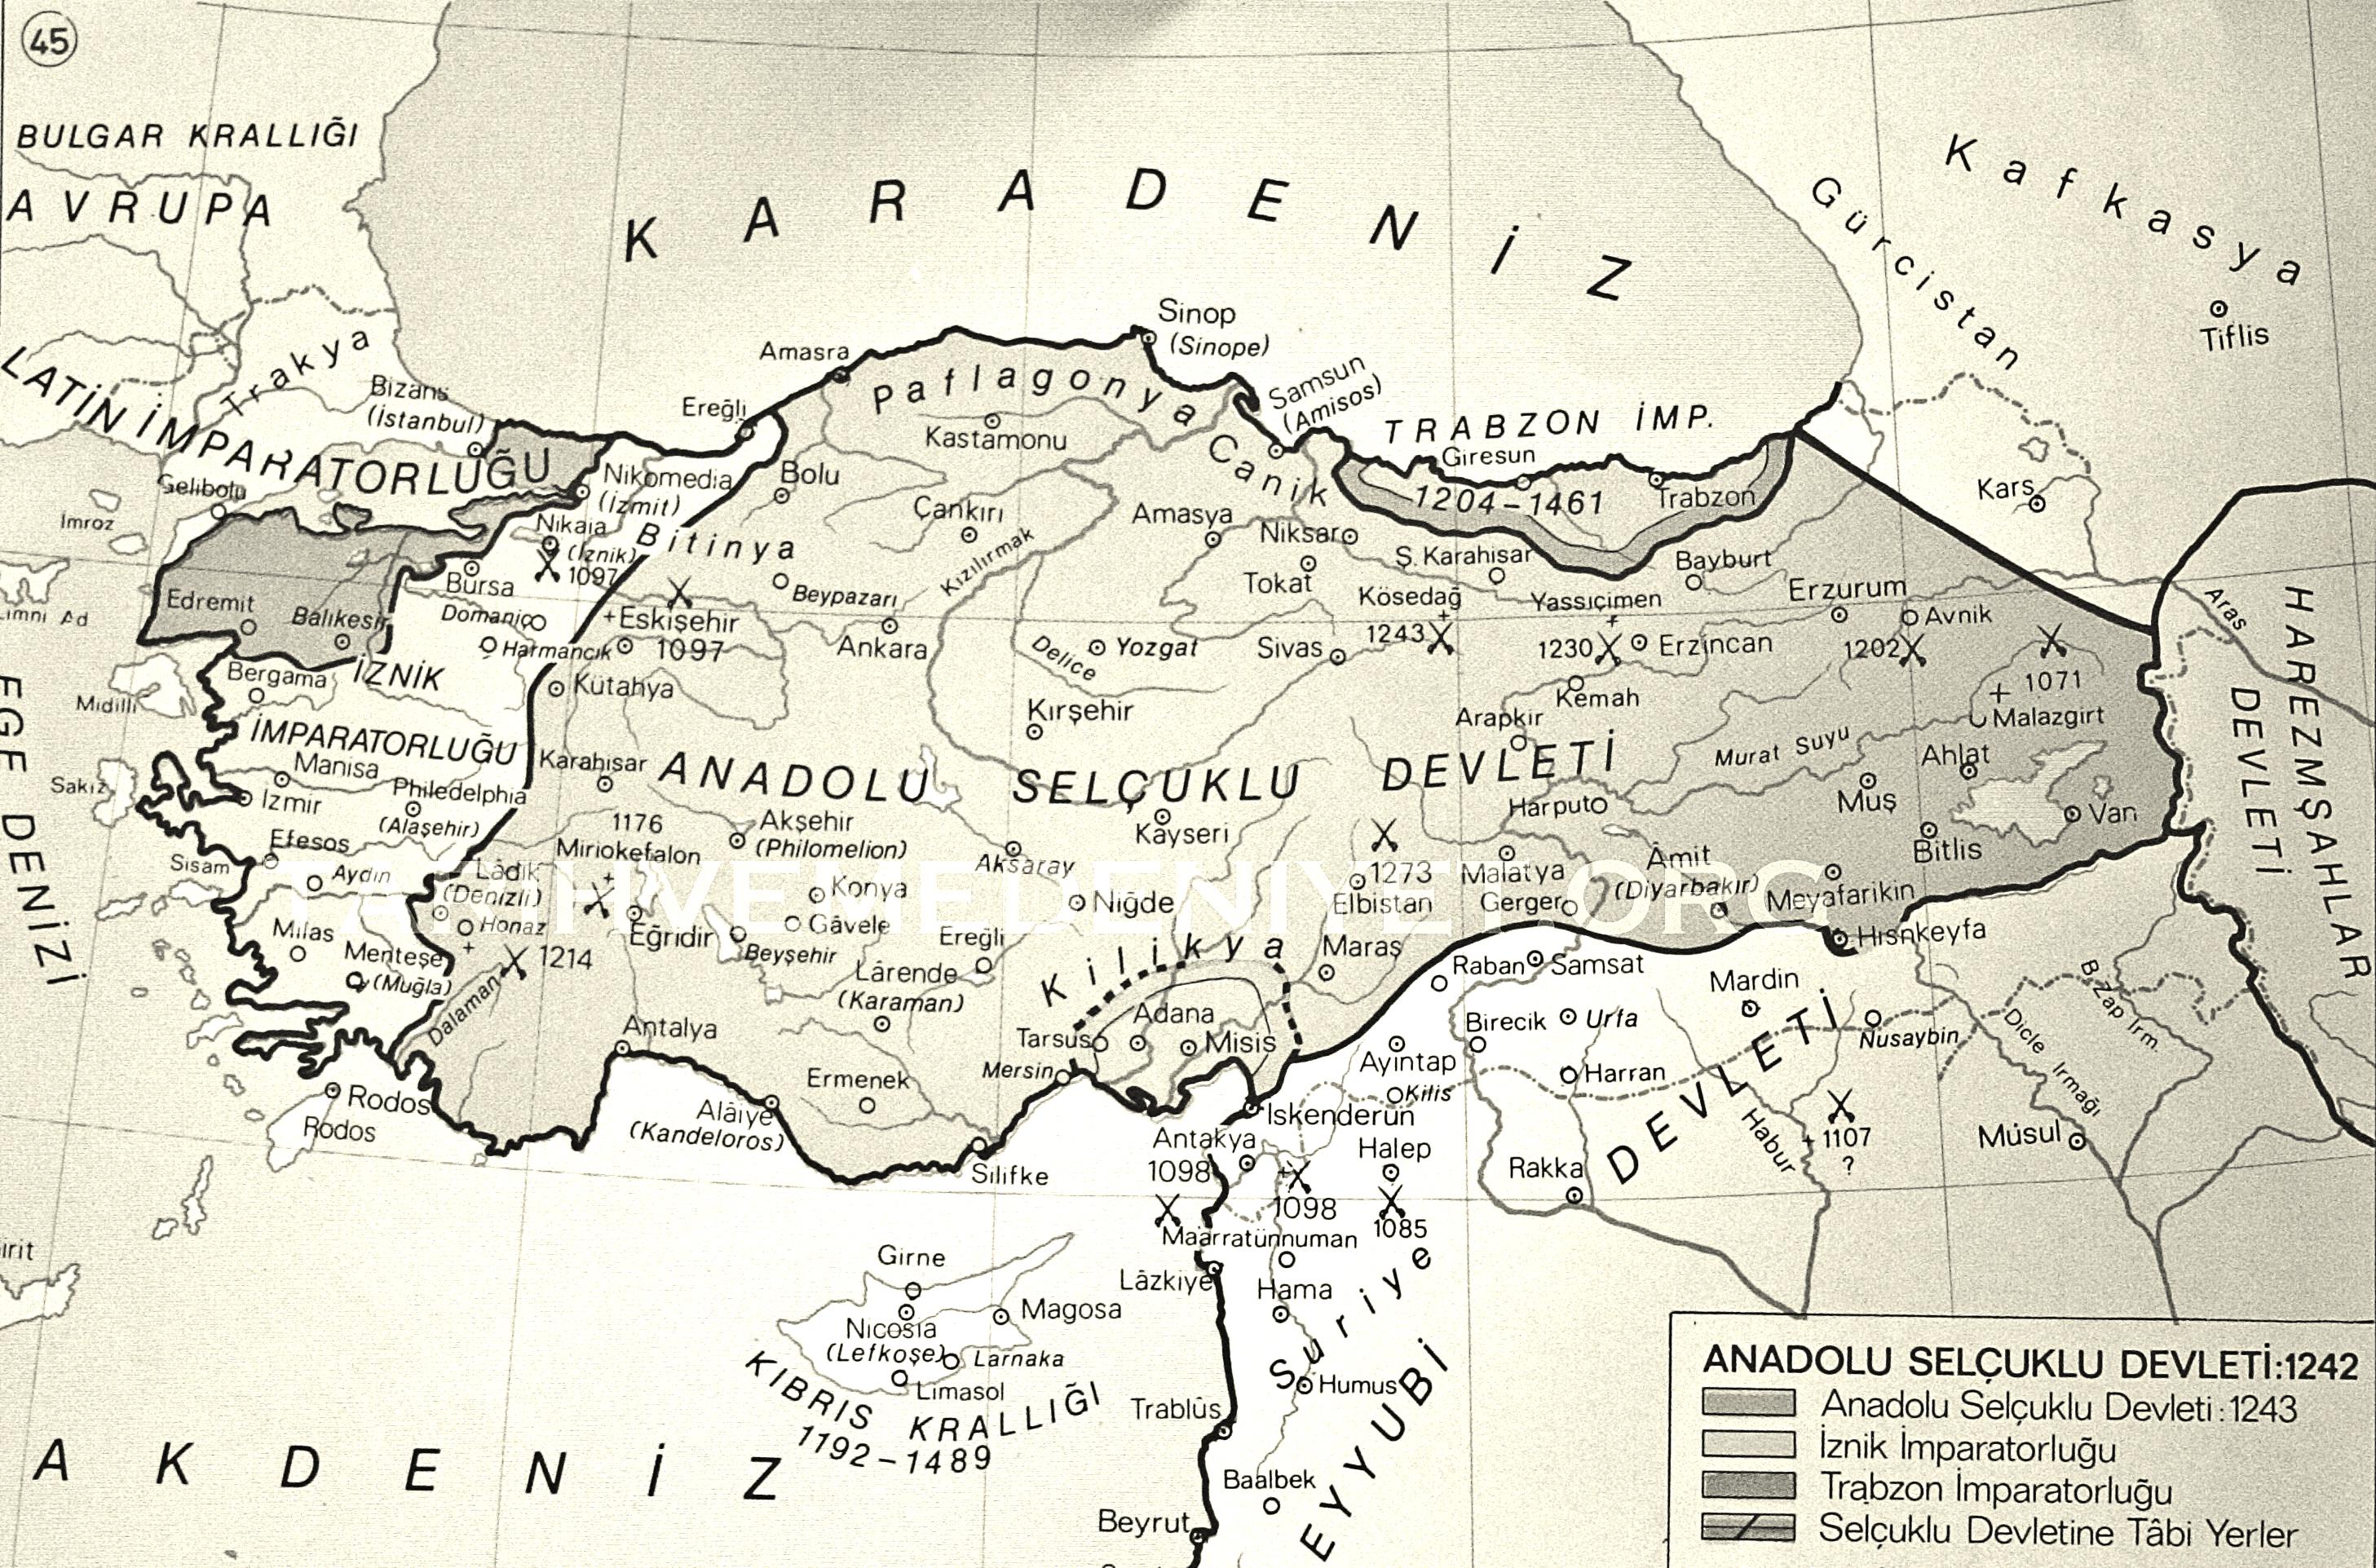 Harita_Anadolu_Selcuklu_Devleti